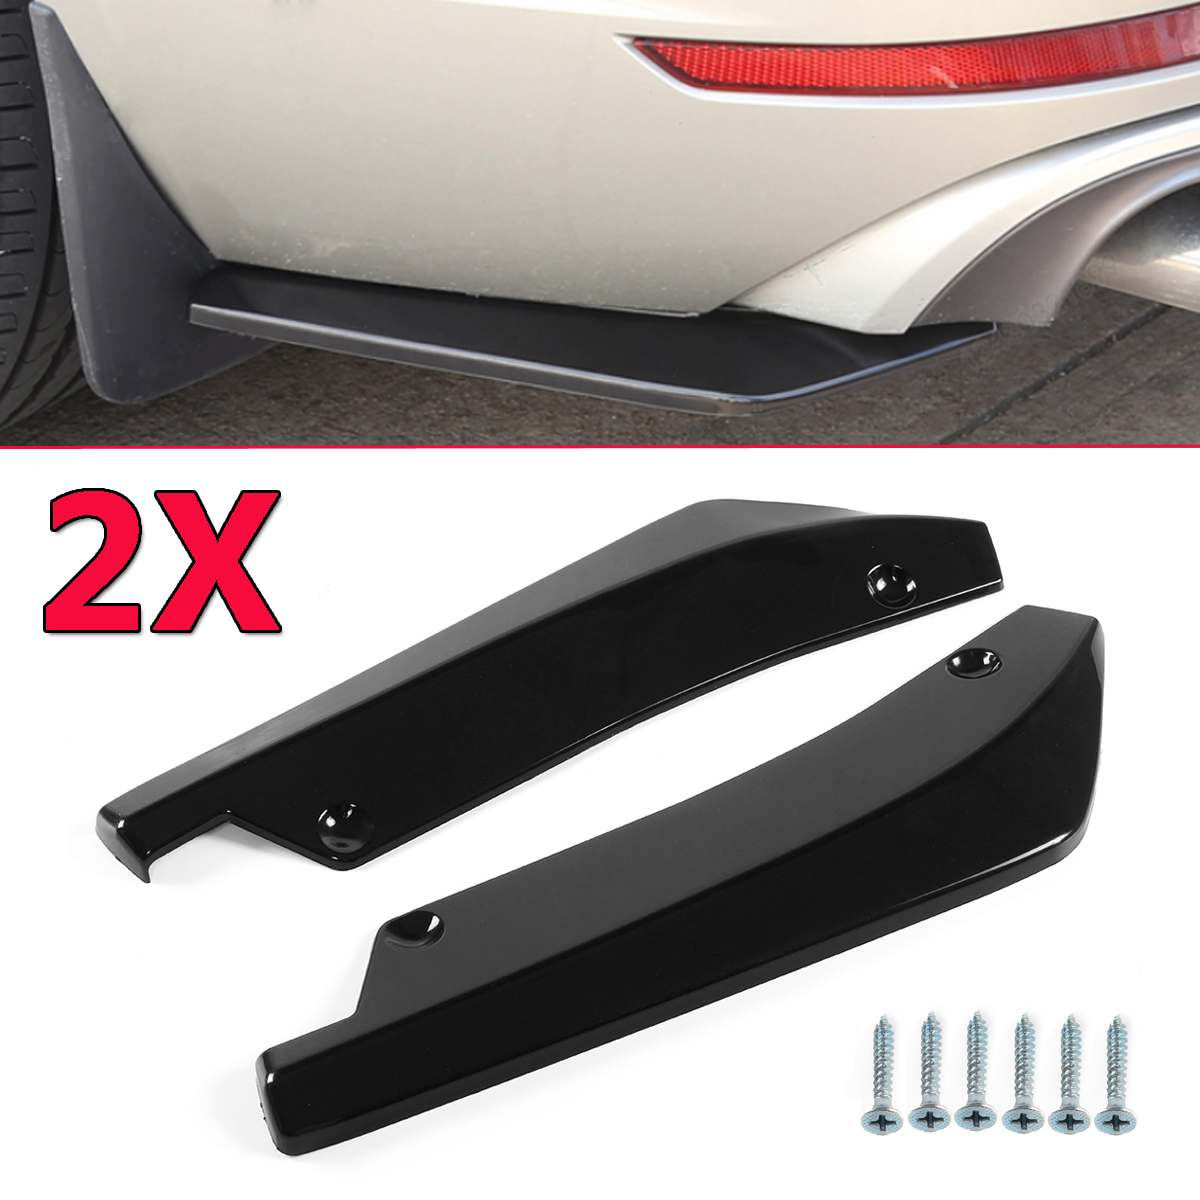 2PCS אוניברסלי סיבי פחמן מראה/שחור רכב אחורי פגוש שפתיים מפזר ספליטר Canard ספוילר מגן לנץ עבור BMW עבור פורד